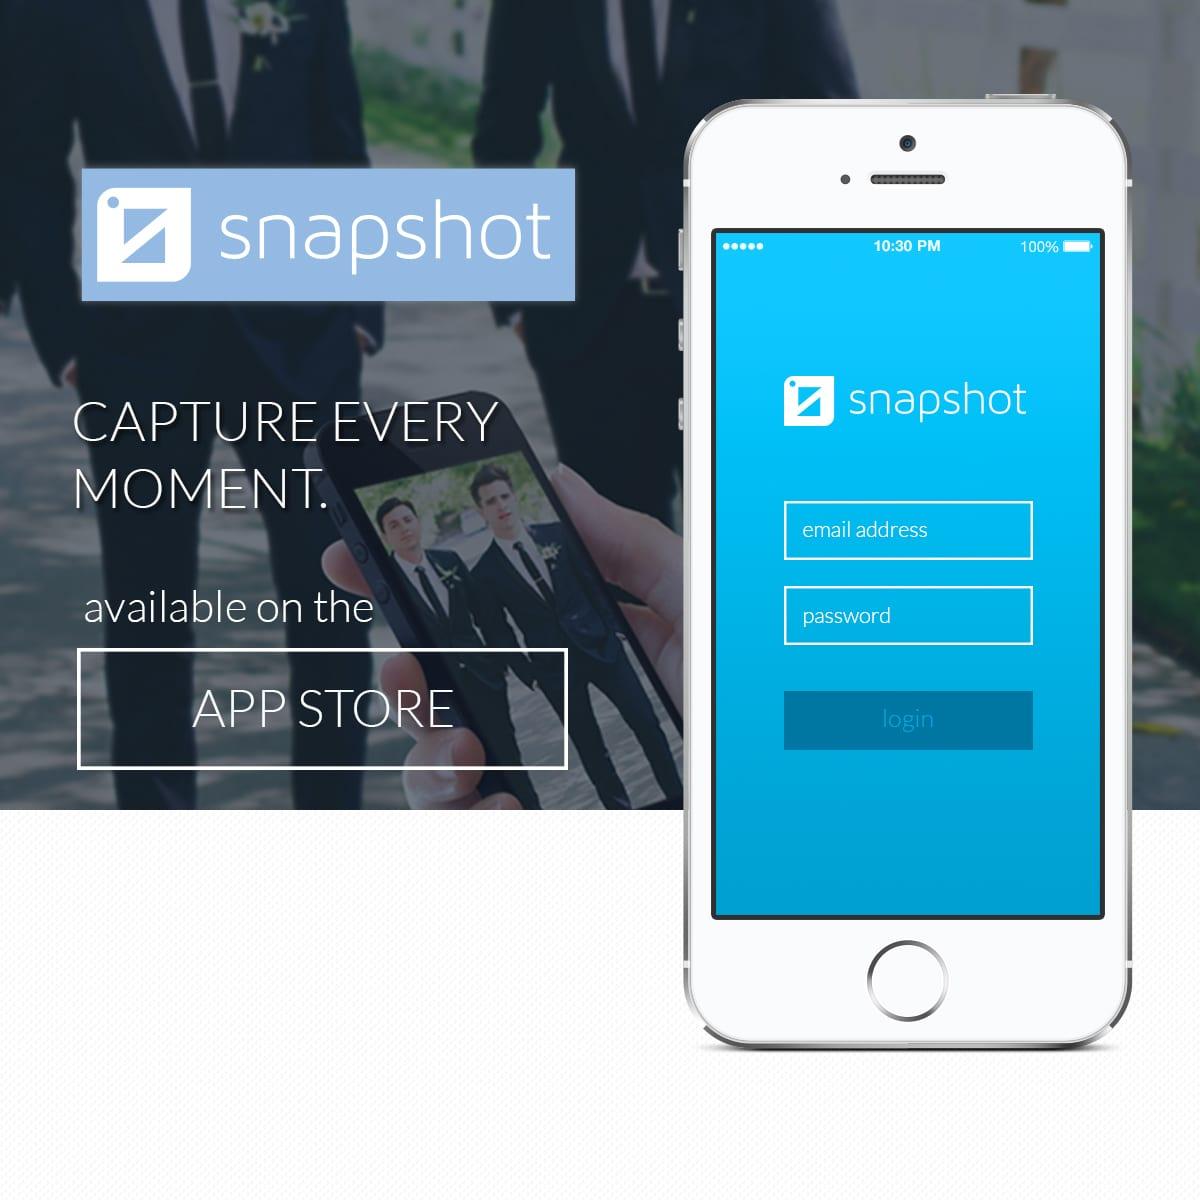 snapshot-iphone-mockup-ad